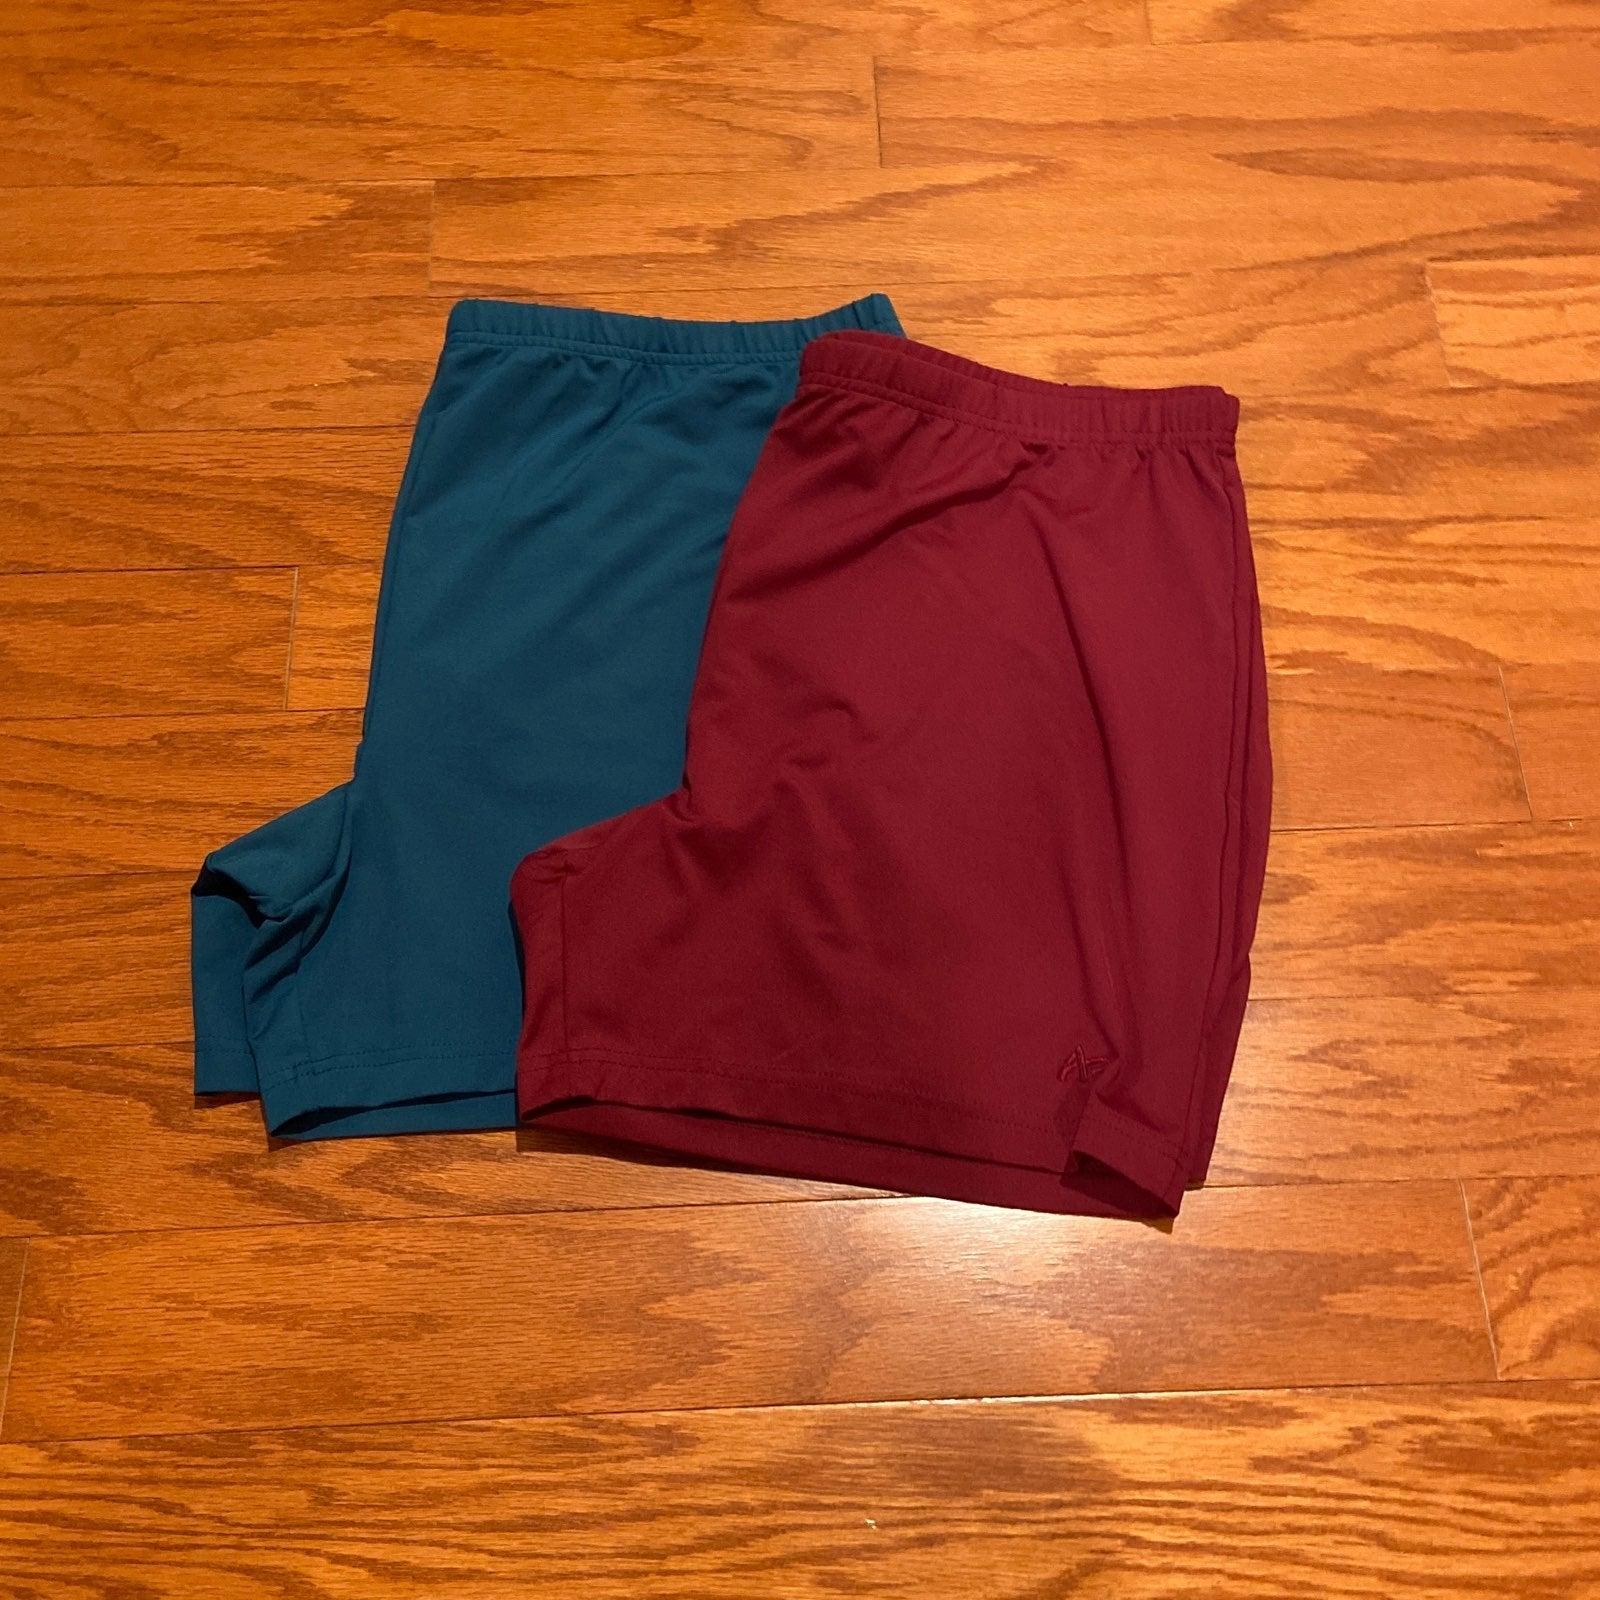 2 Pairs of Athletech Shorts